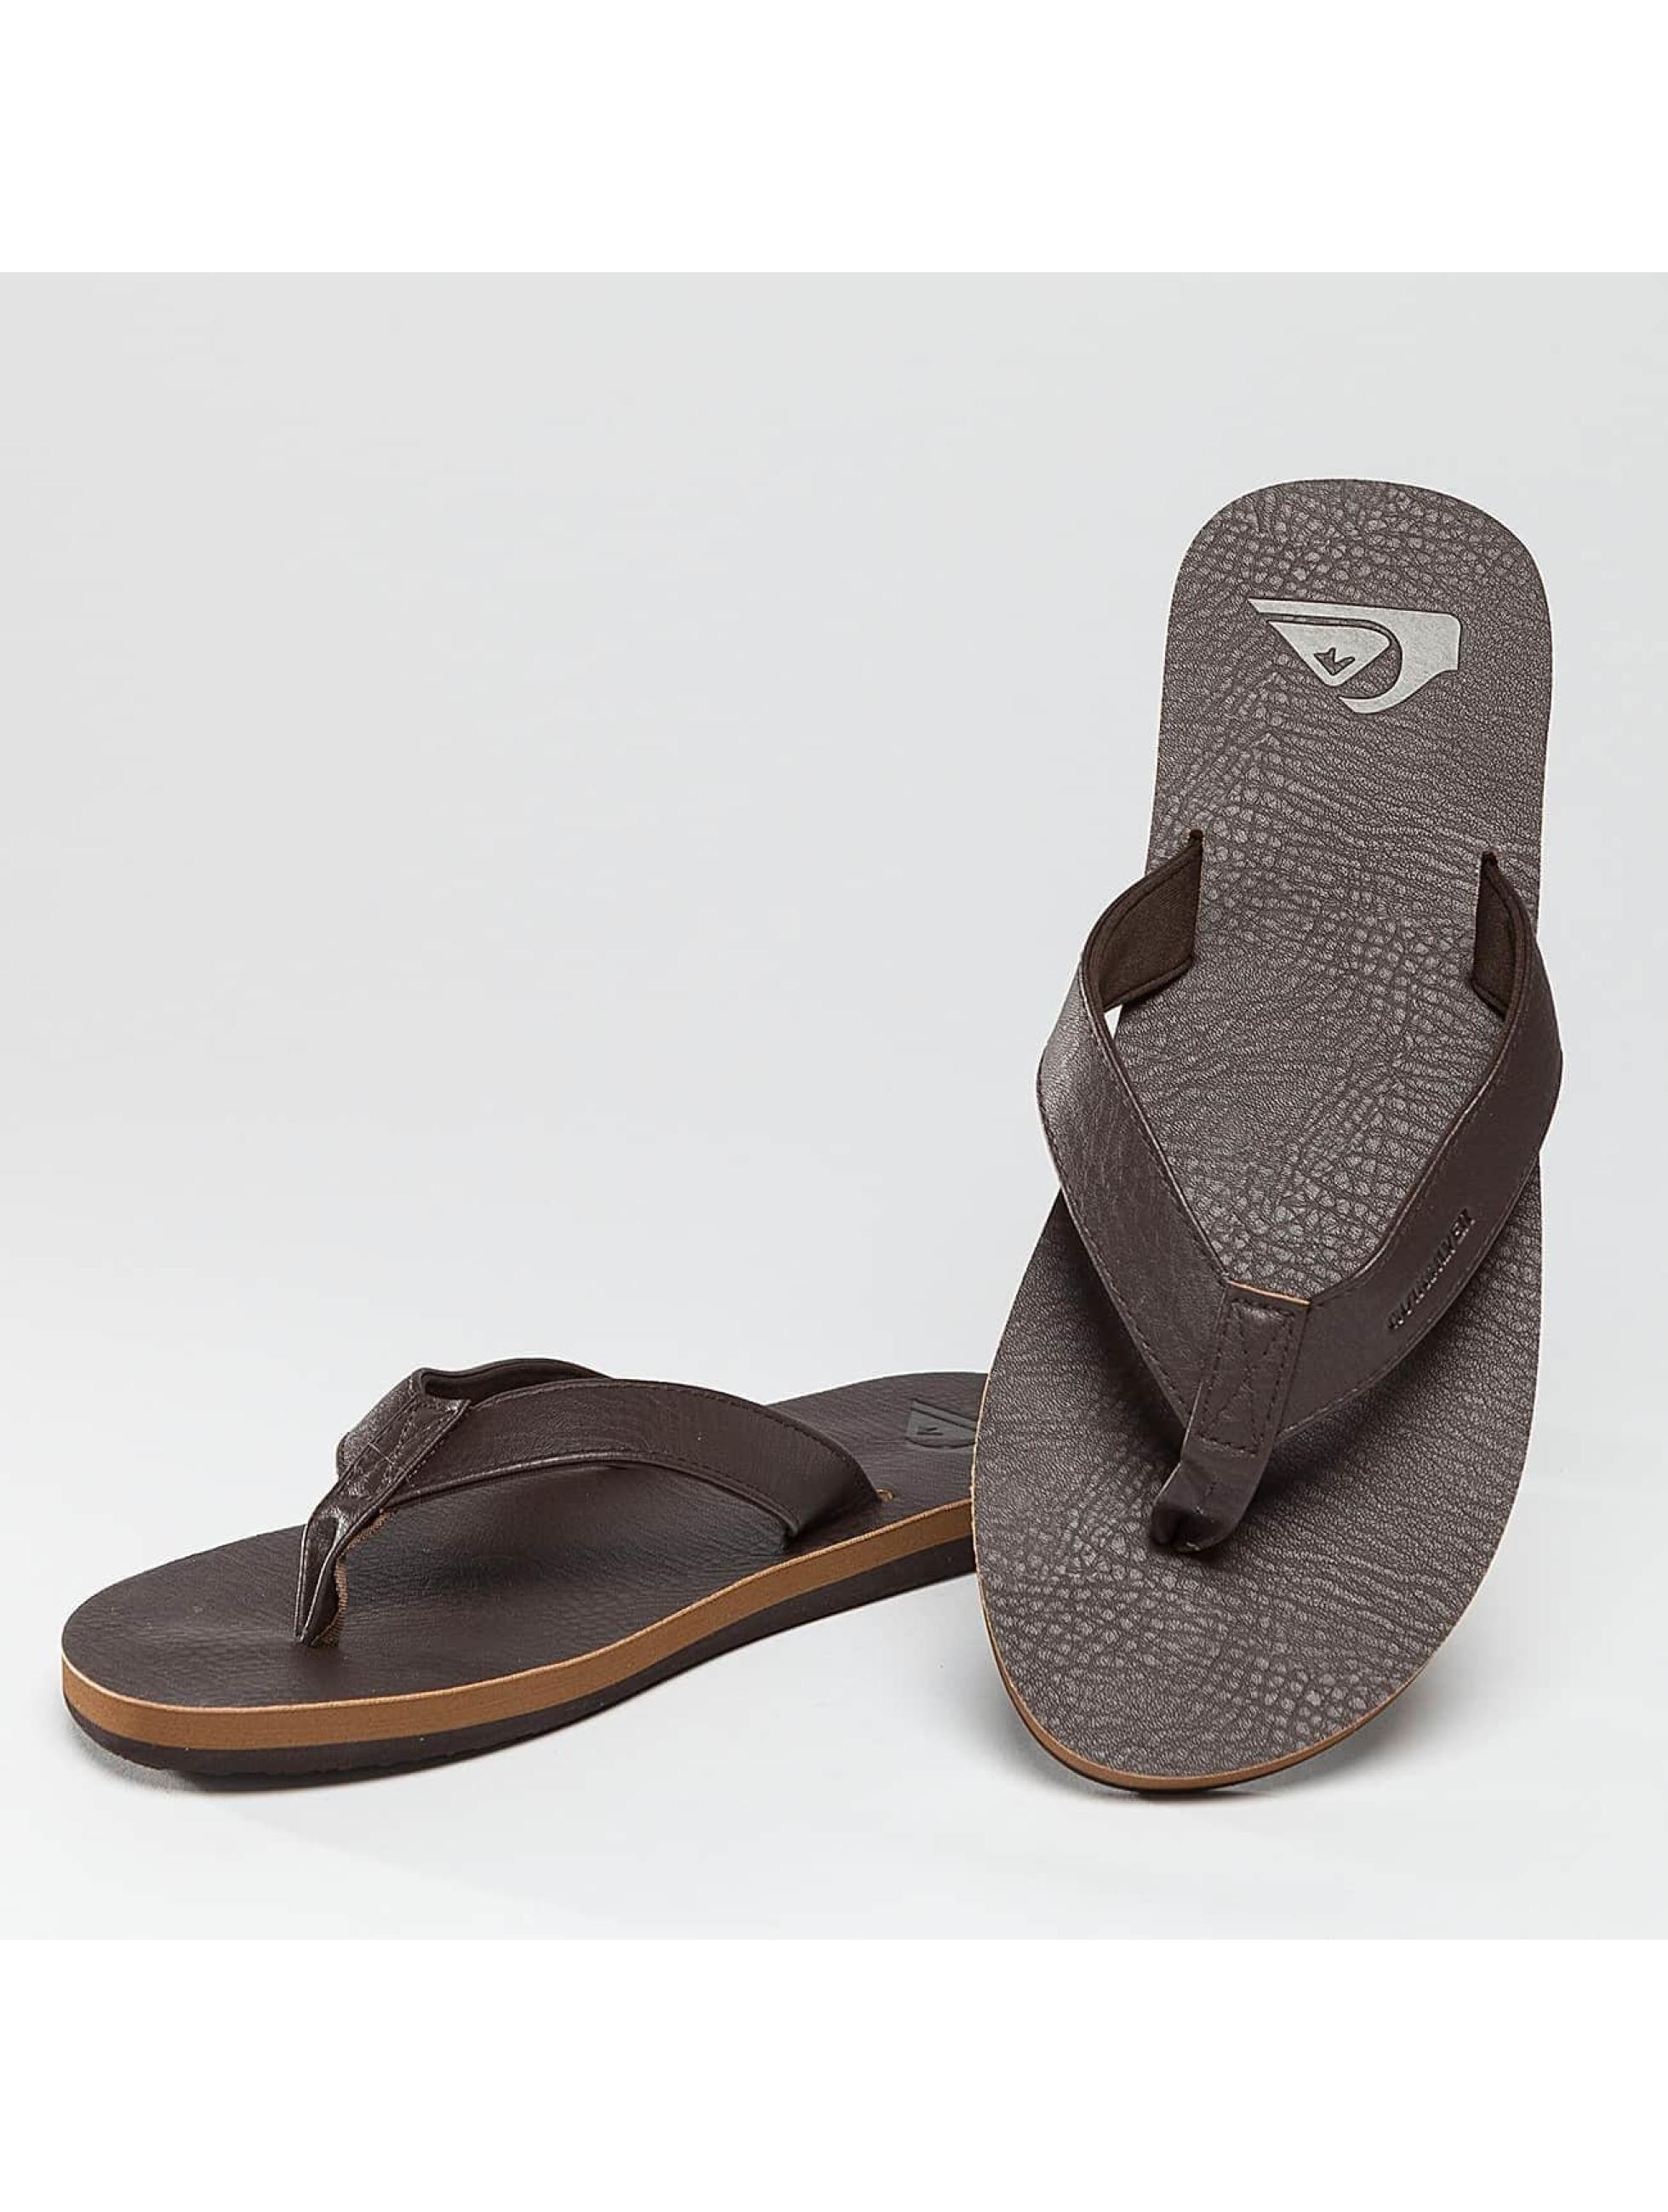 Quiksilver Sandals Molokai Nubuck brown